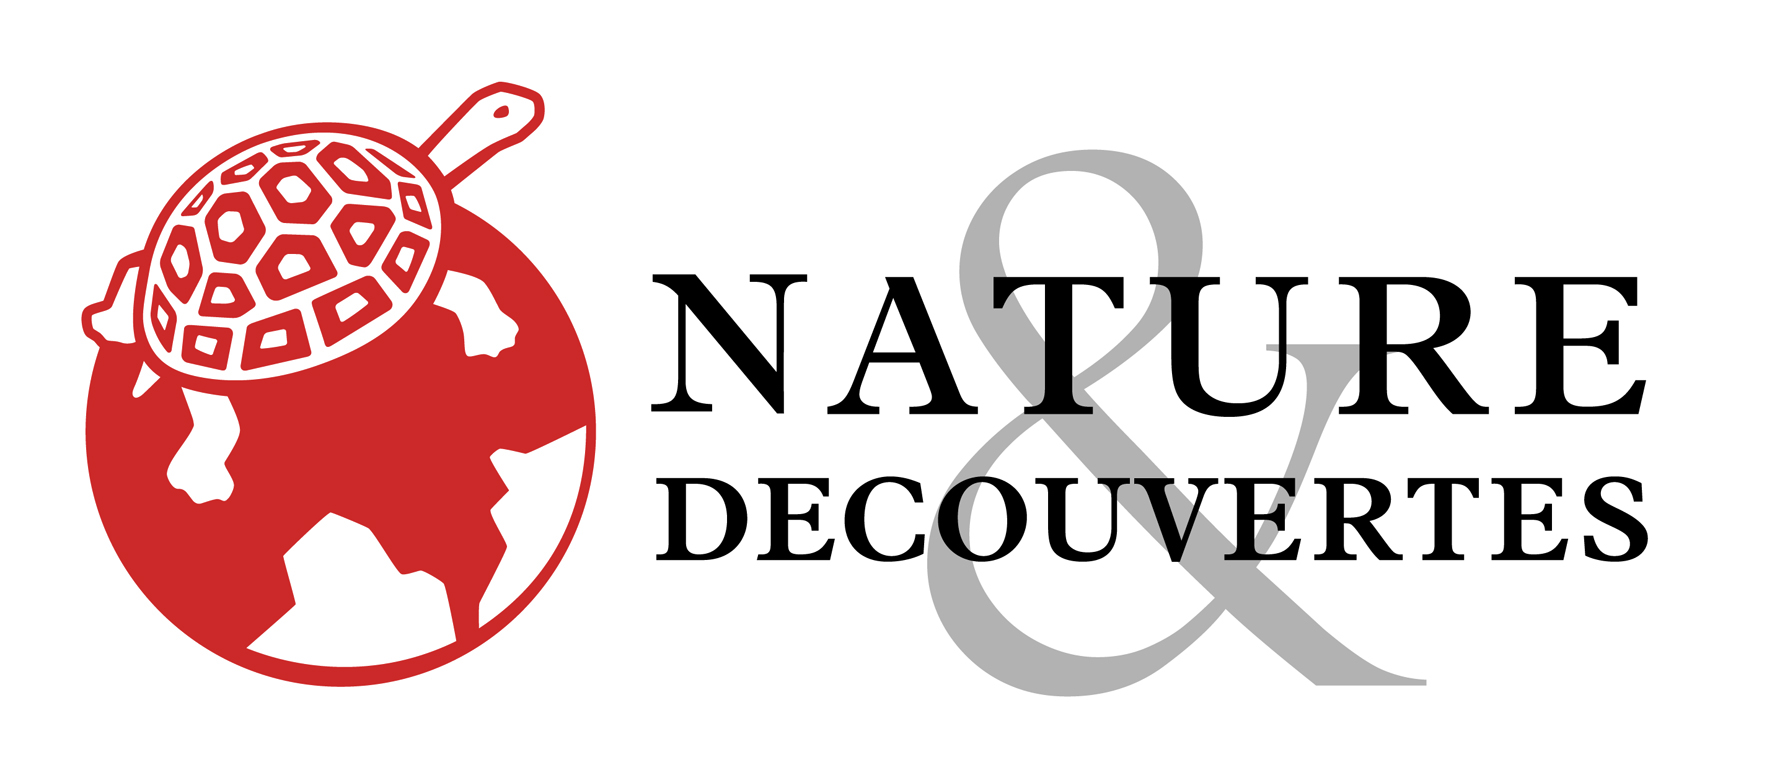 https://cdnfiles2.biolovision.net/www.gobg.ch/userfiles/Torcol/logo-NetD-2013-H-quadri.jpg